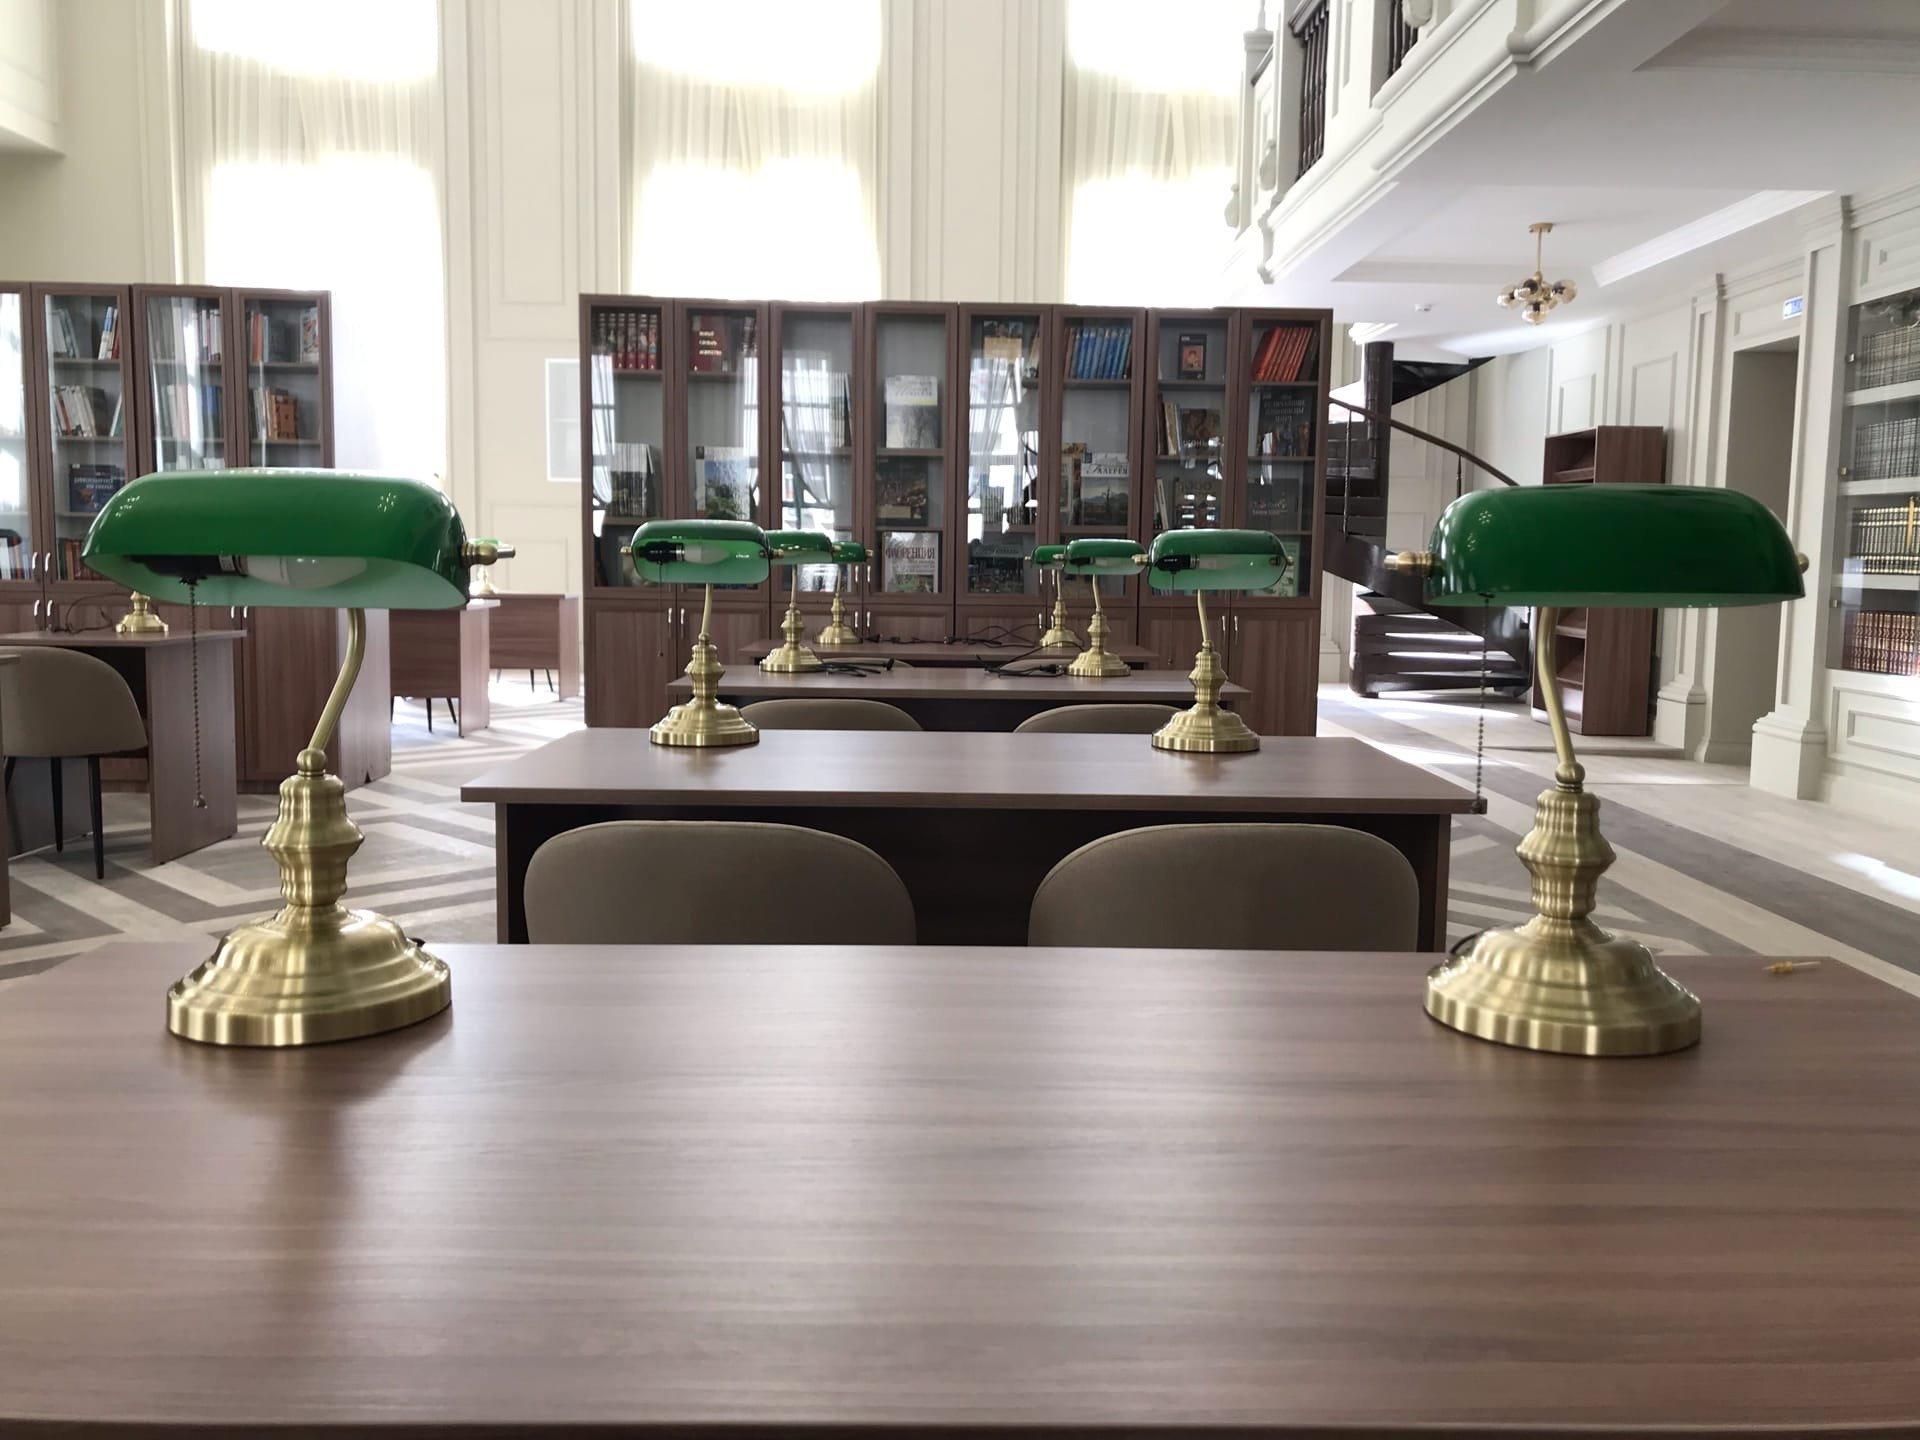 Итоги дня: открытие Нацбиблиотеки в Ижевске и антирекорд по заболеваемости ковидом в Удмуртии